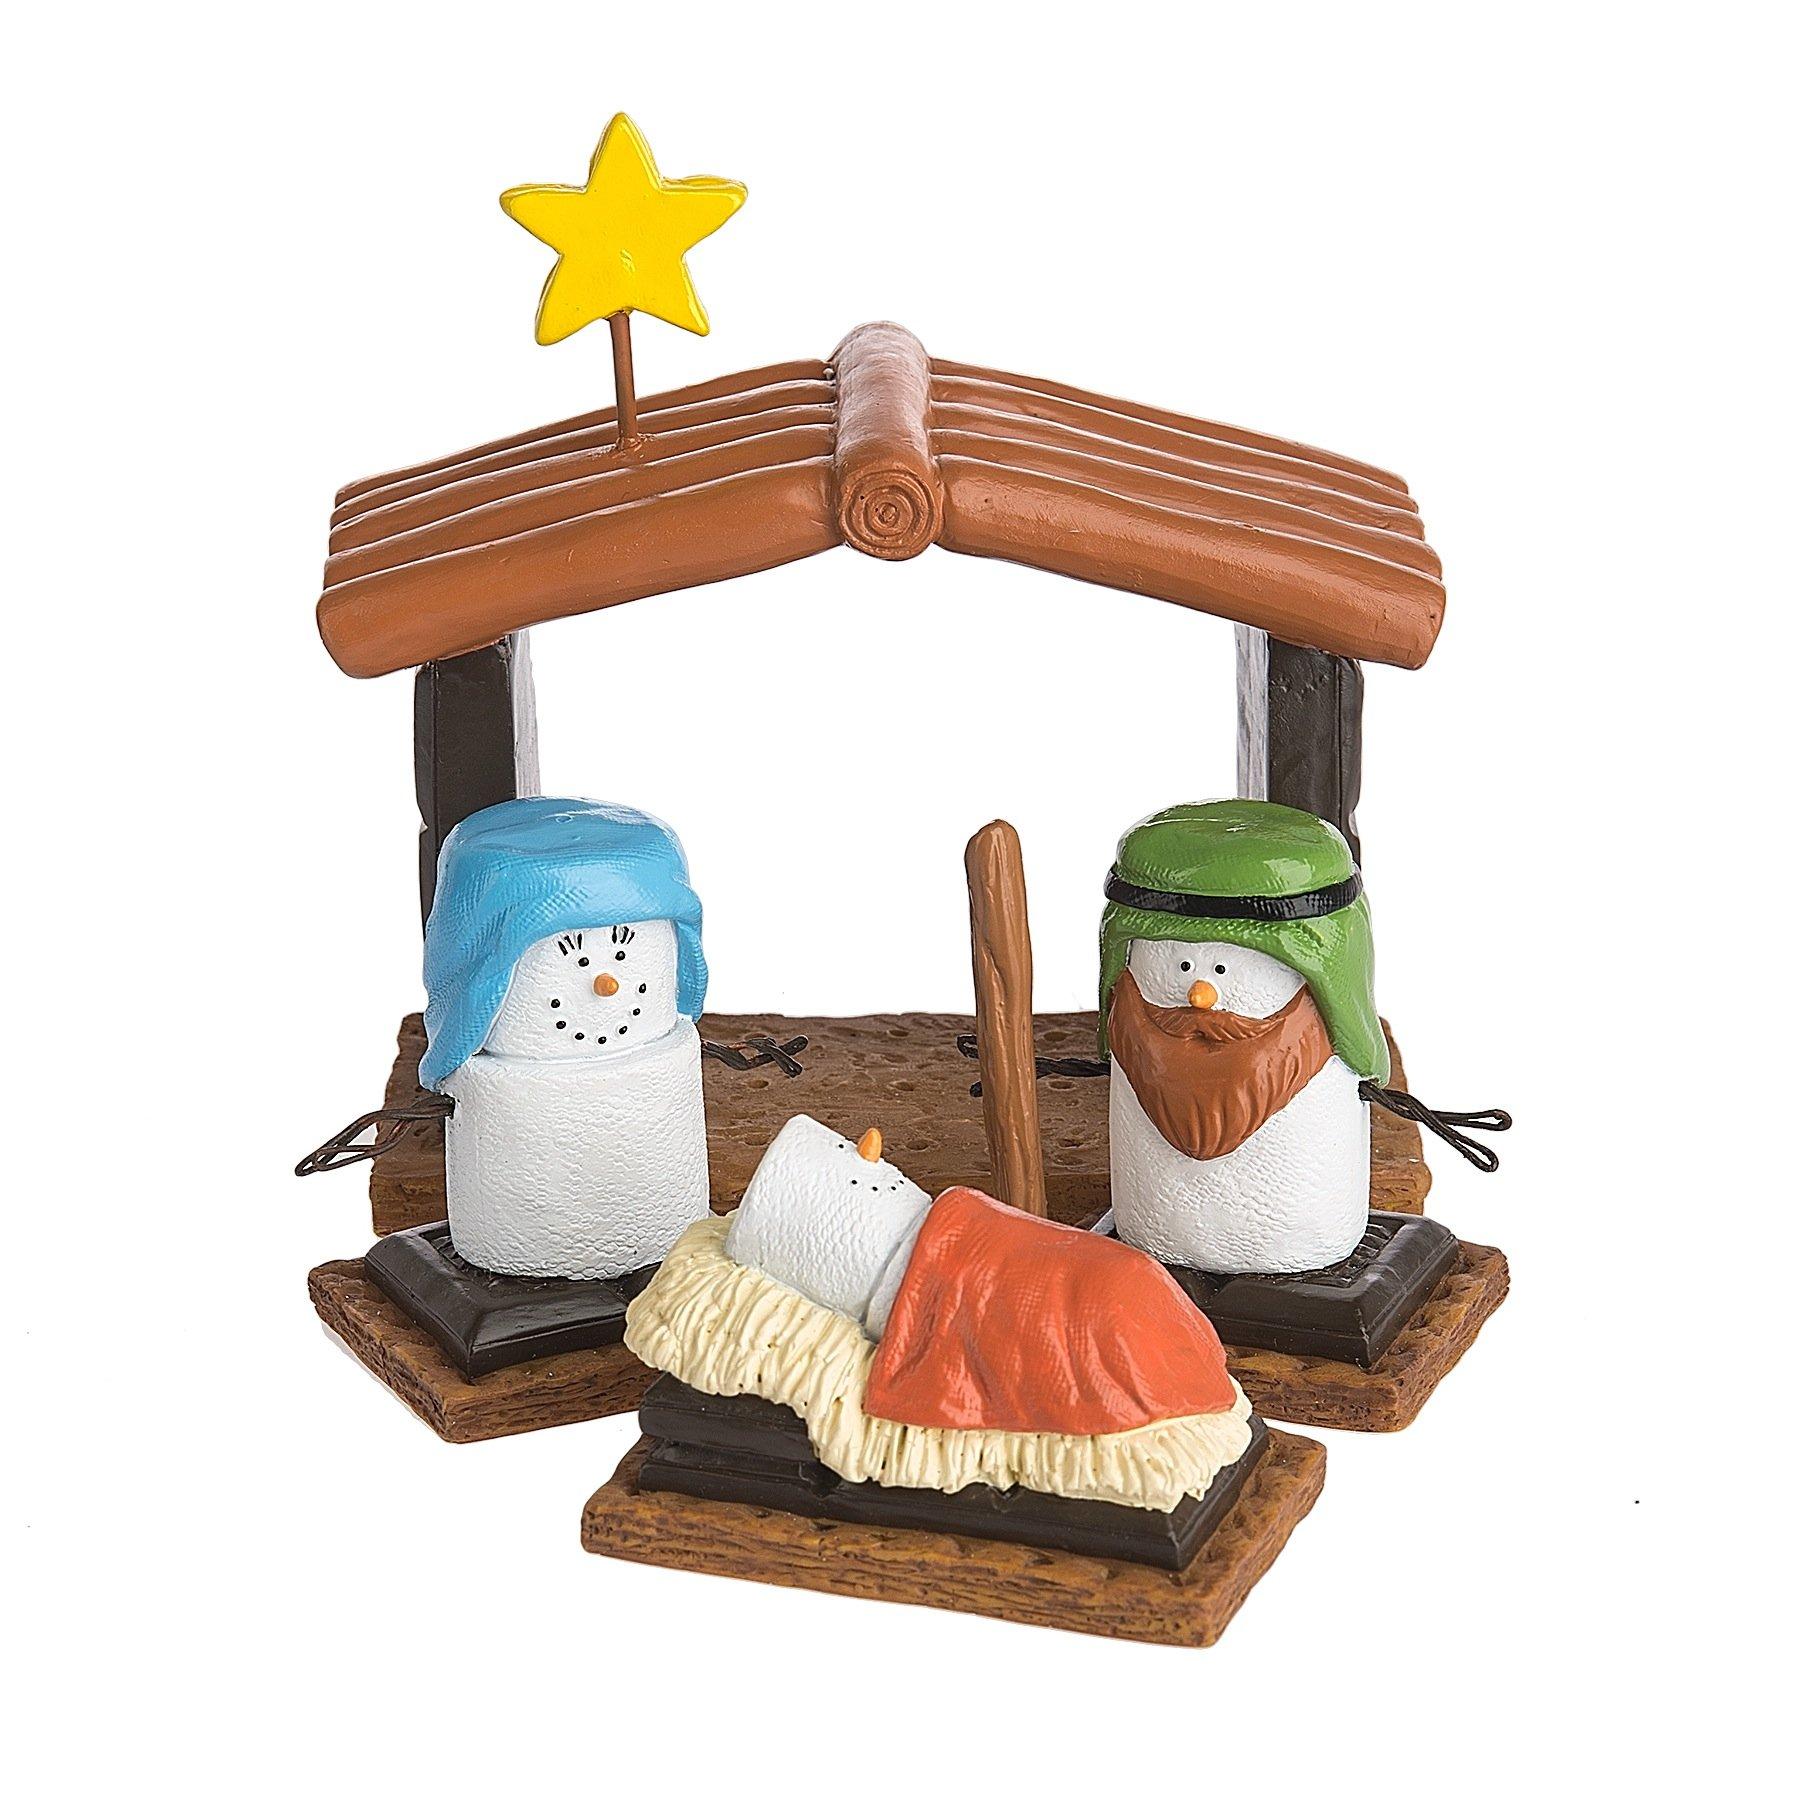 Christmas Decoration S'mores Nativity Scene 4 Piece Set